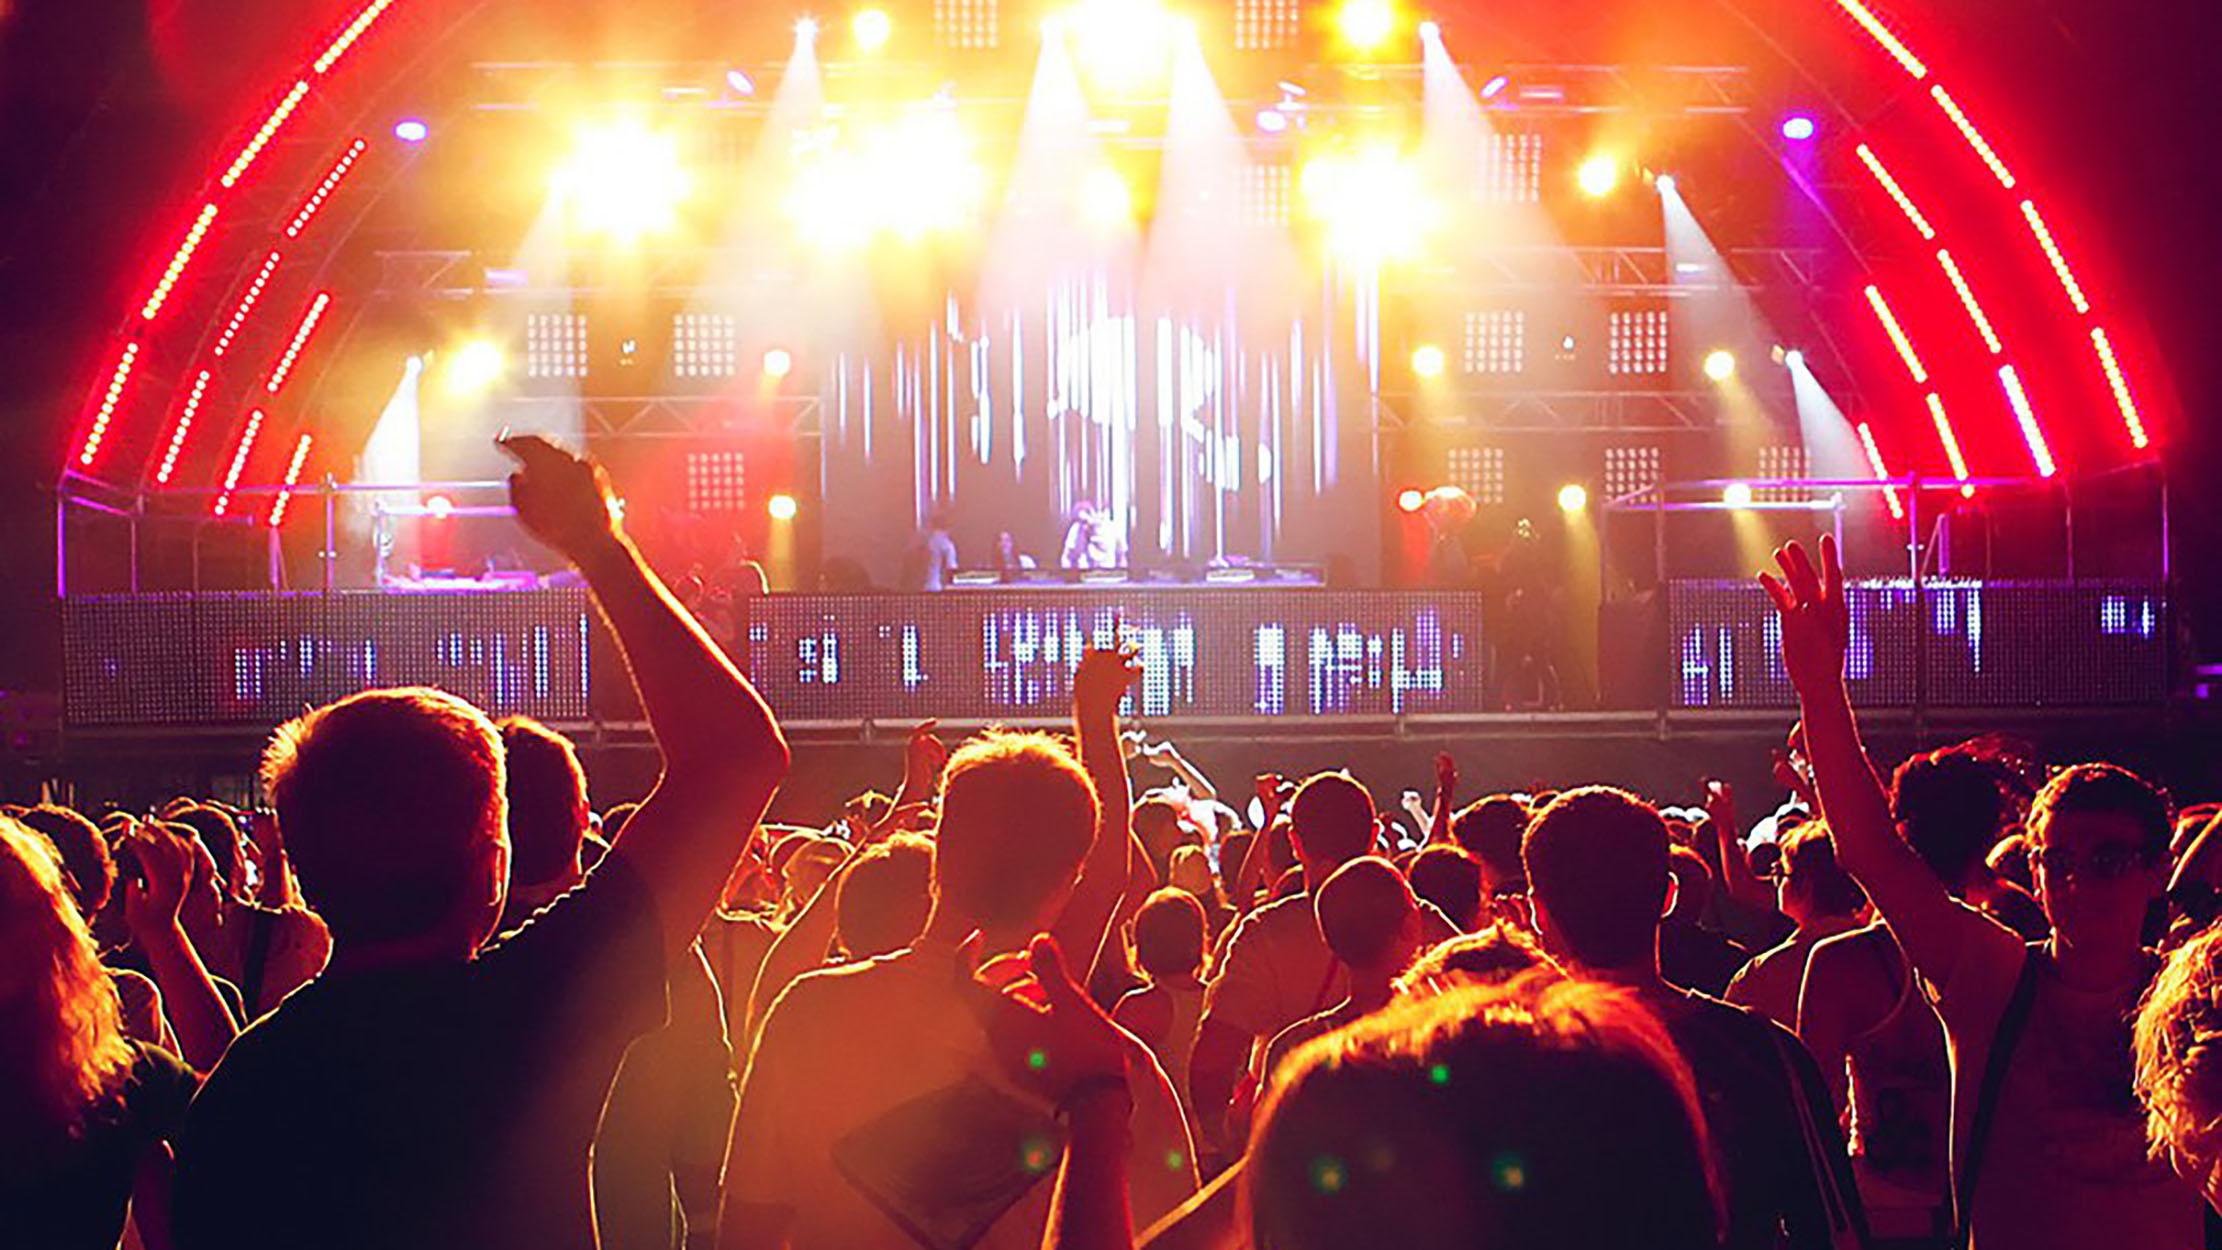 Live events professional sound lights